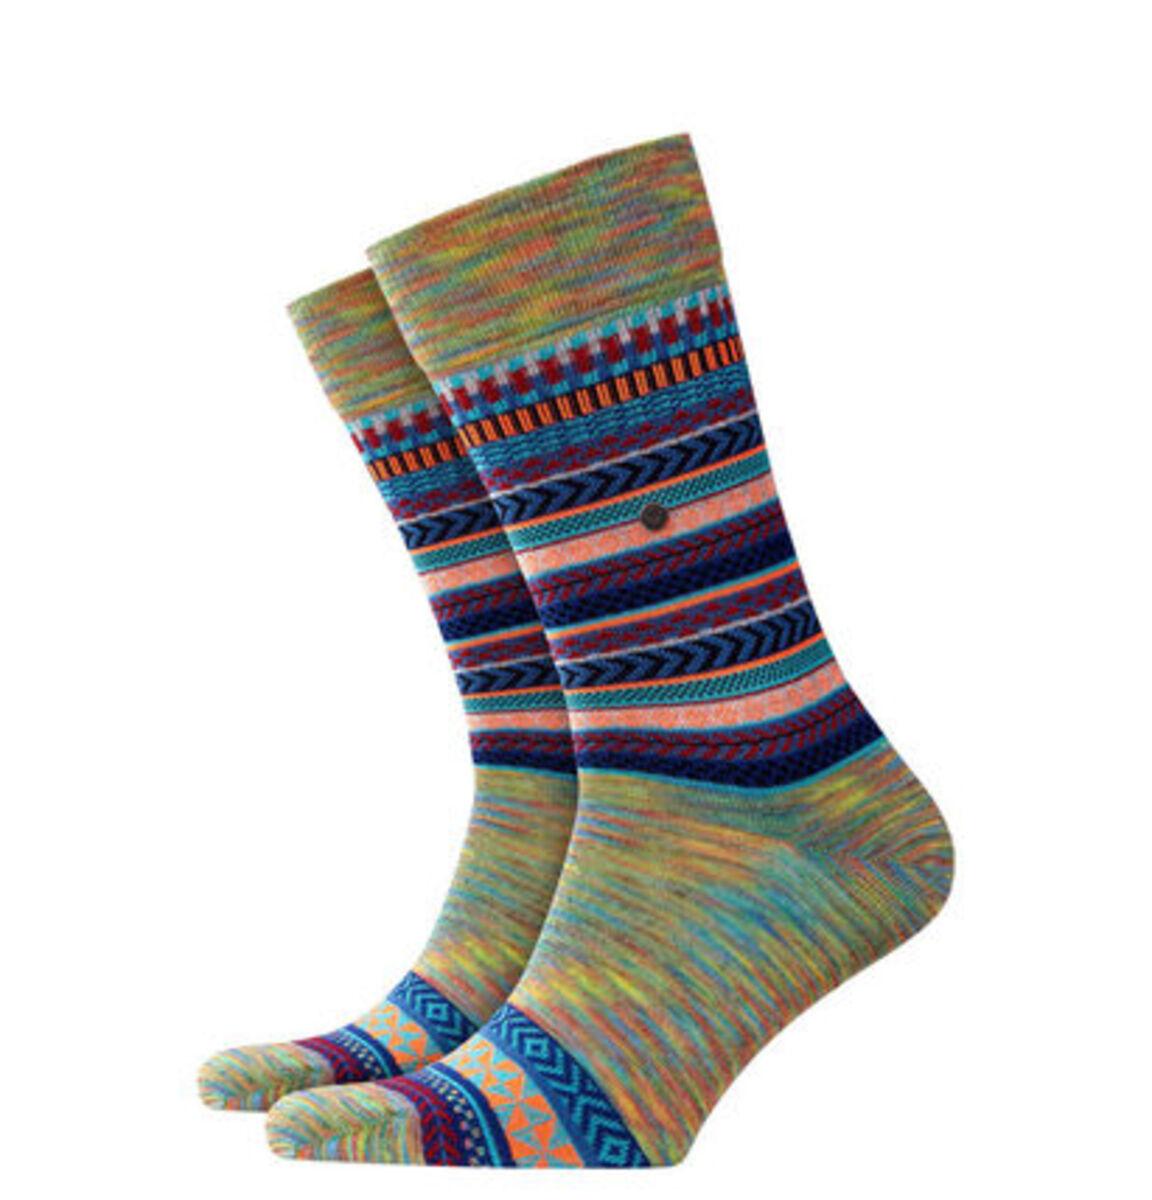 "Bild 1 von Burlington Socken ""The X-Fair Isle"", Multicolor-Garn, Schurwolle, 6576 lupin, 40-46"